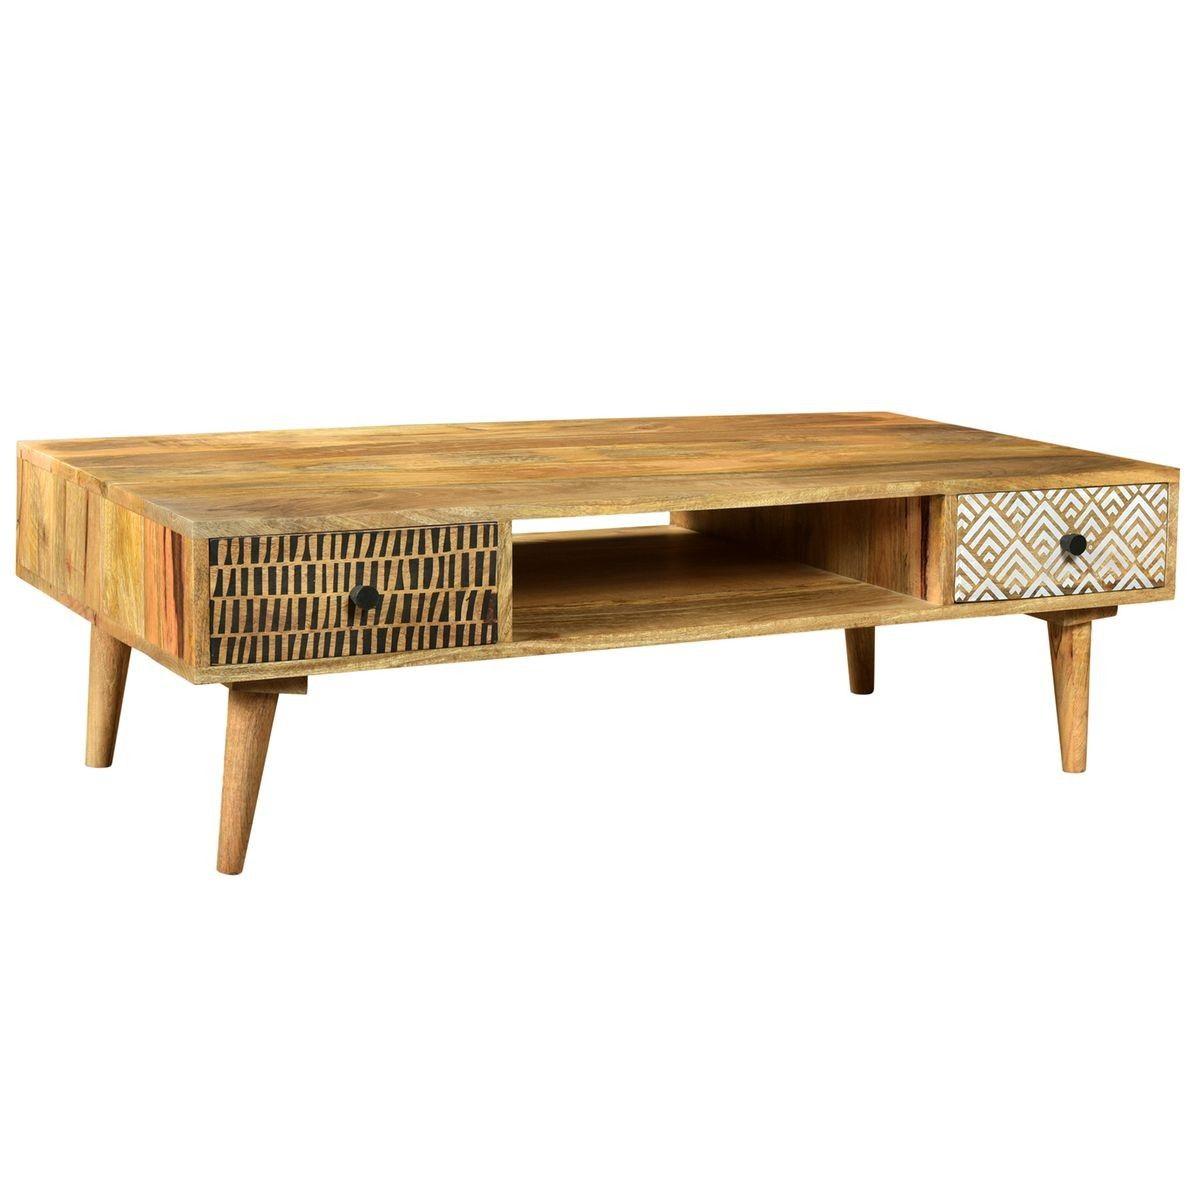 Table Basse Tali En Bois 2 Tiroirs Taille Tu Table Basse Deco Table Basse Bois